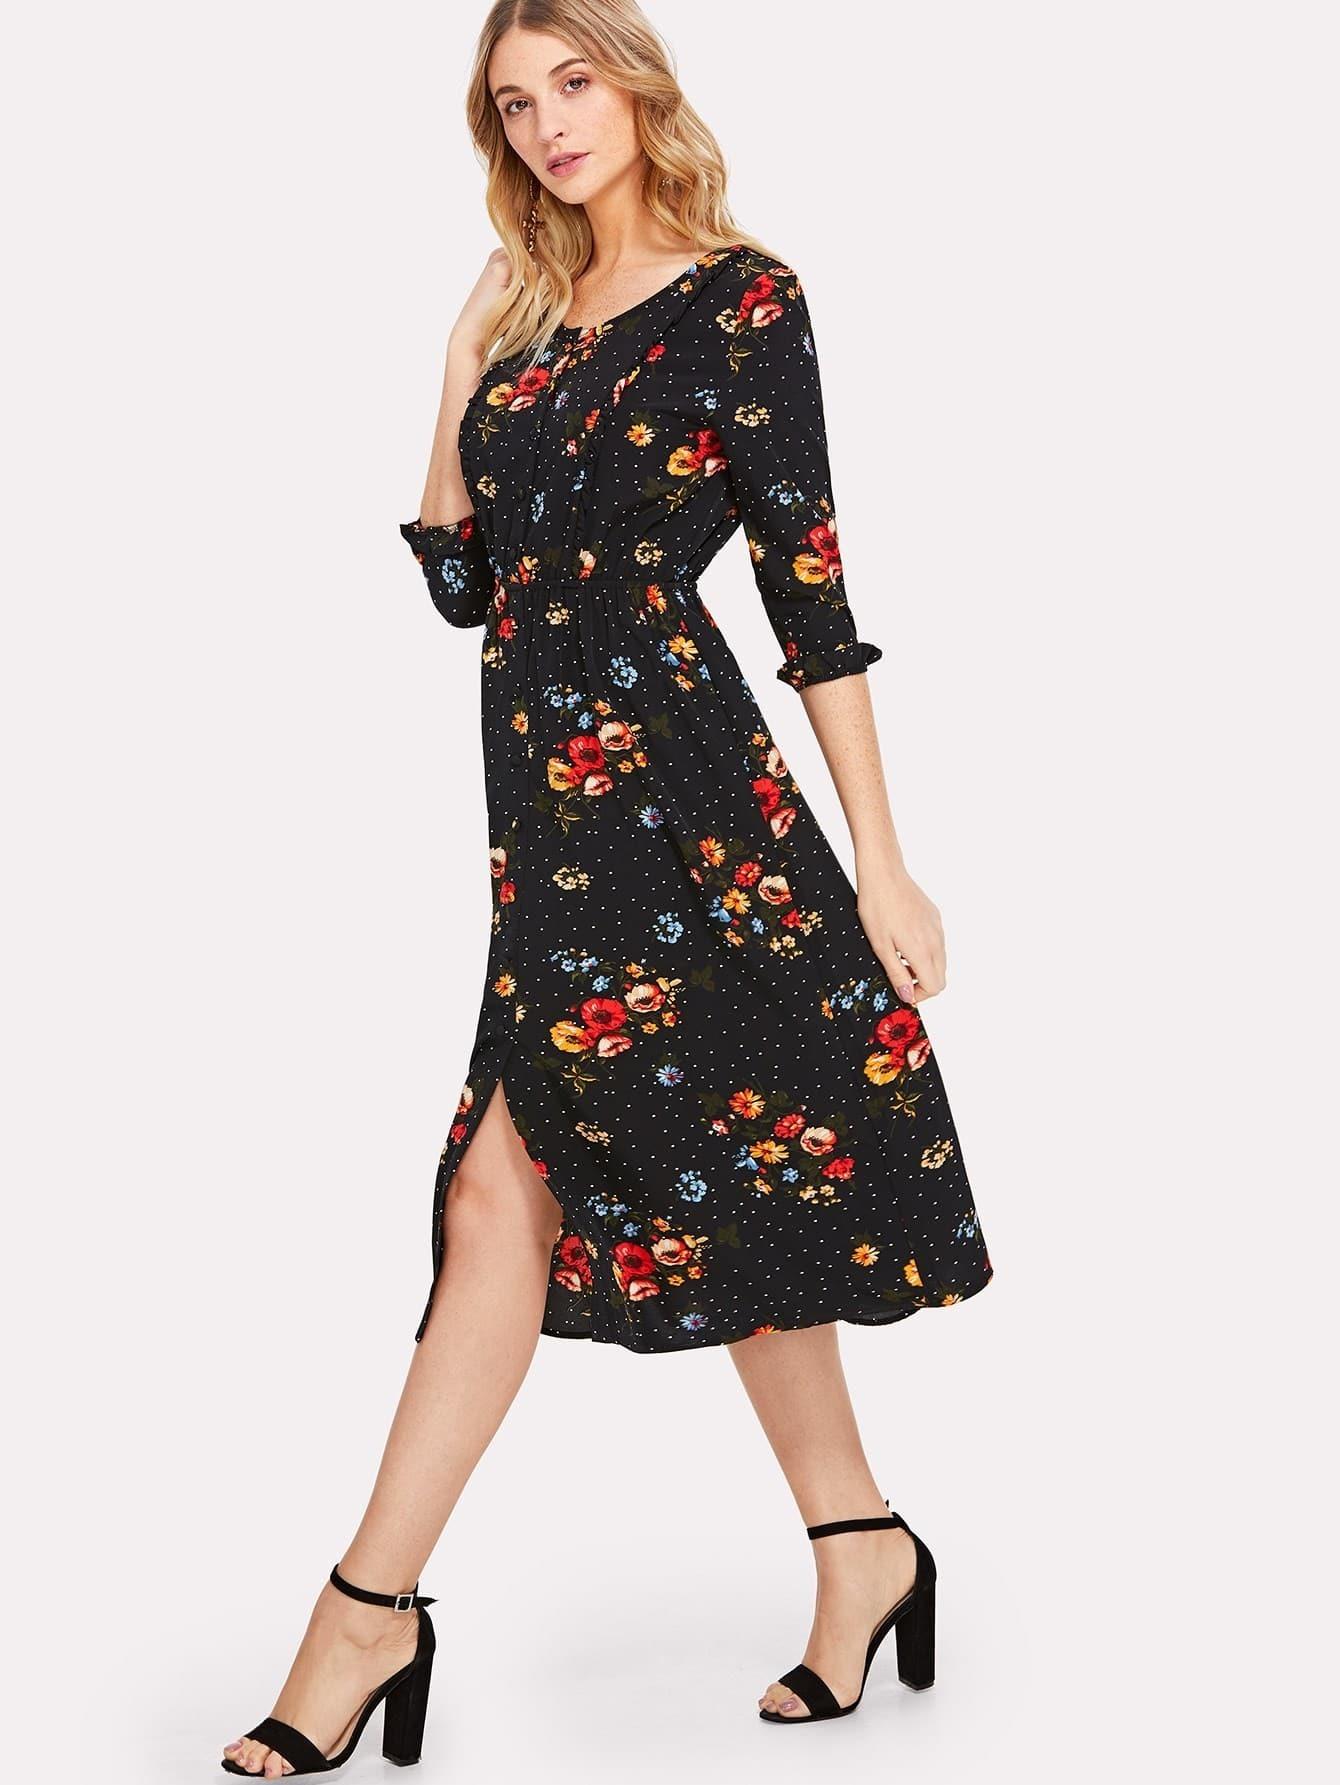 Button Up Frilled Floral Dress